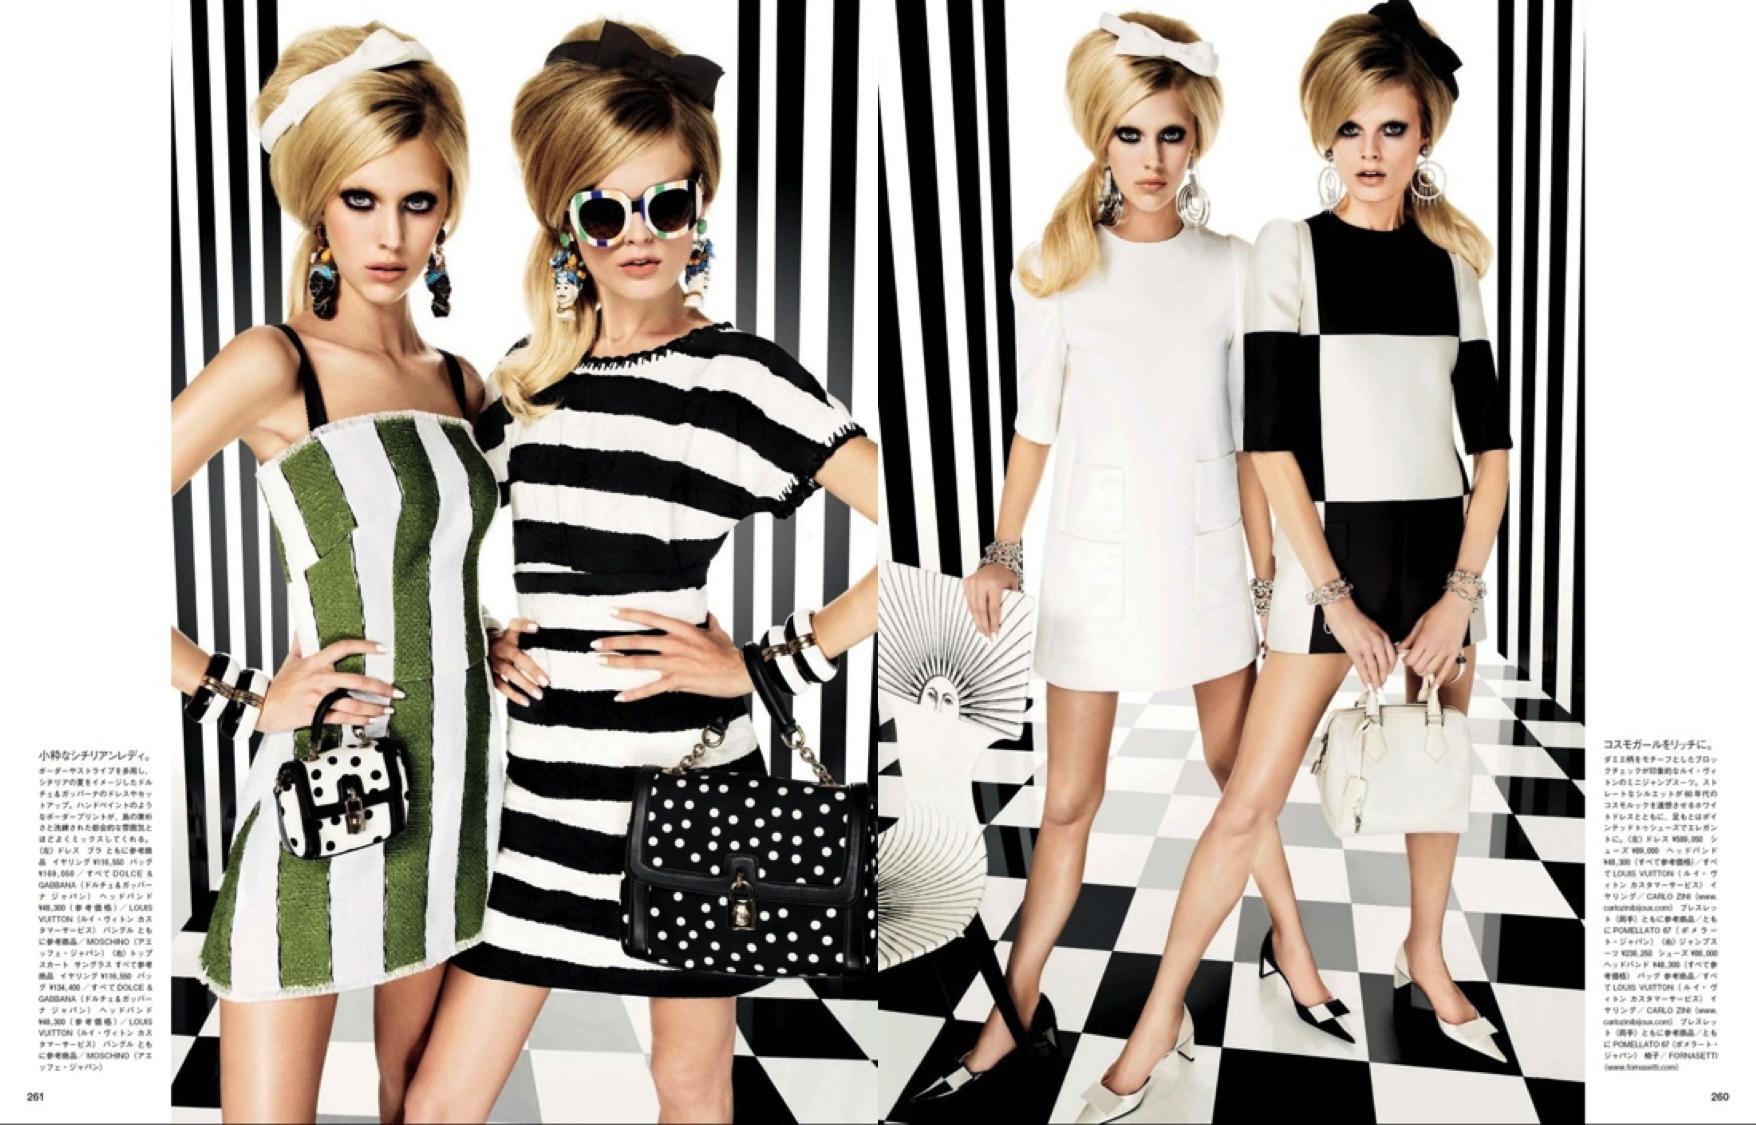 bold-stripes-trend_Anna-Dello-Russo-styling_photographer-Giampaolo-Sgura_graphics-gone-wild-editorial_vogue-japan-editorials_best-editorials-2013_Juliana-Schurig-fashion-style-editorials_Hanne-Gaby-Odiele-fashion-editorials-style